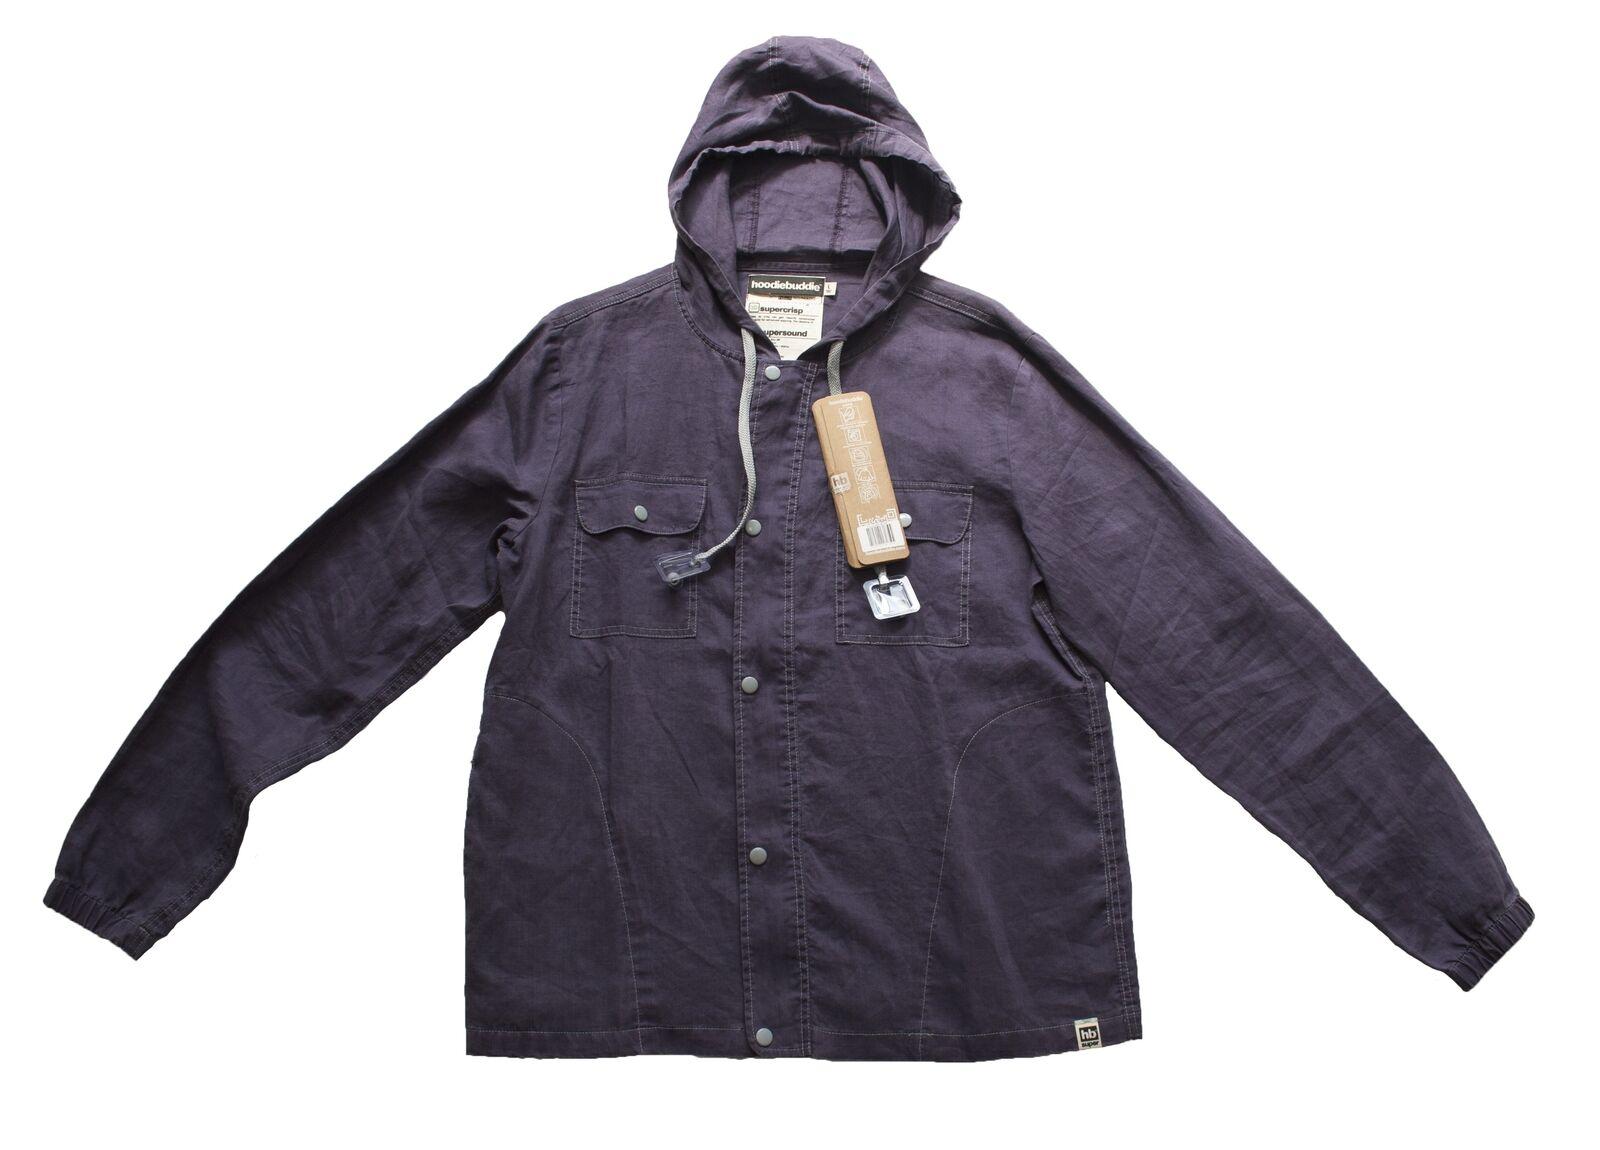 HoodieBuddie Senior Full Zip Shirt Variation